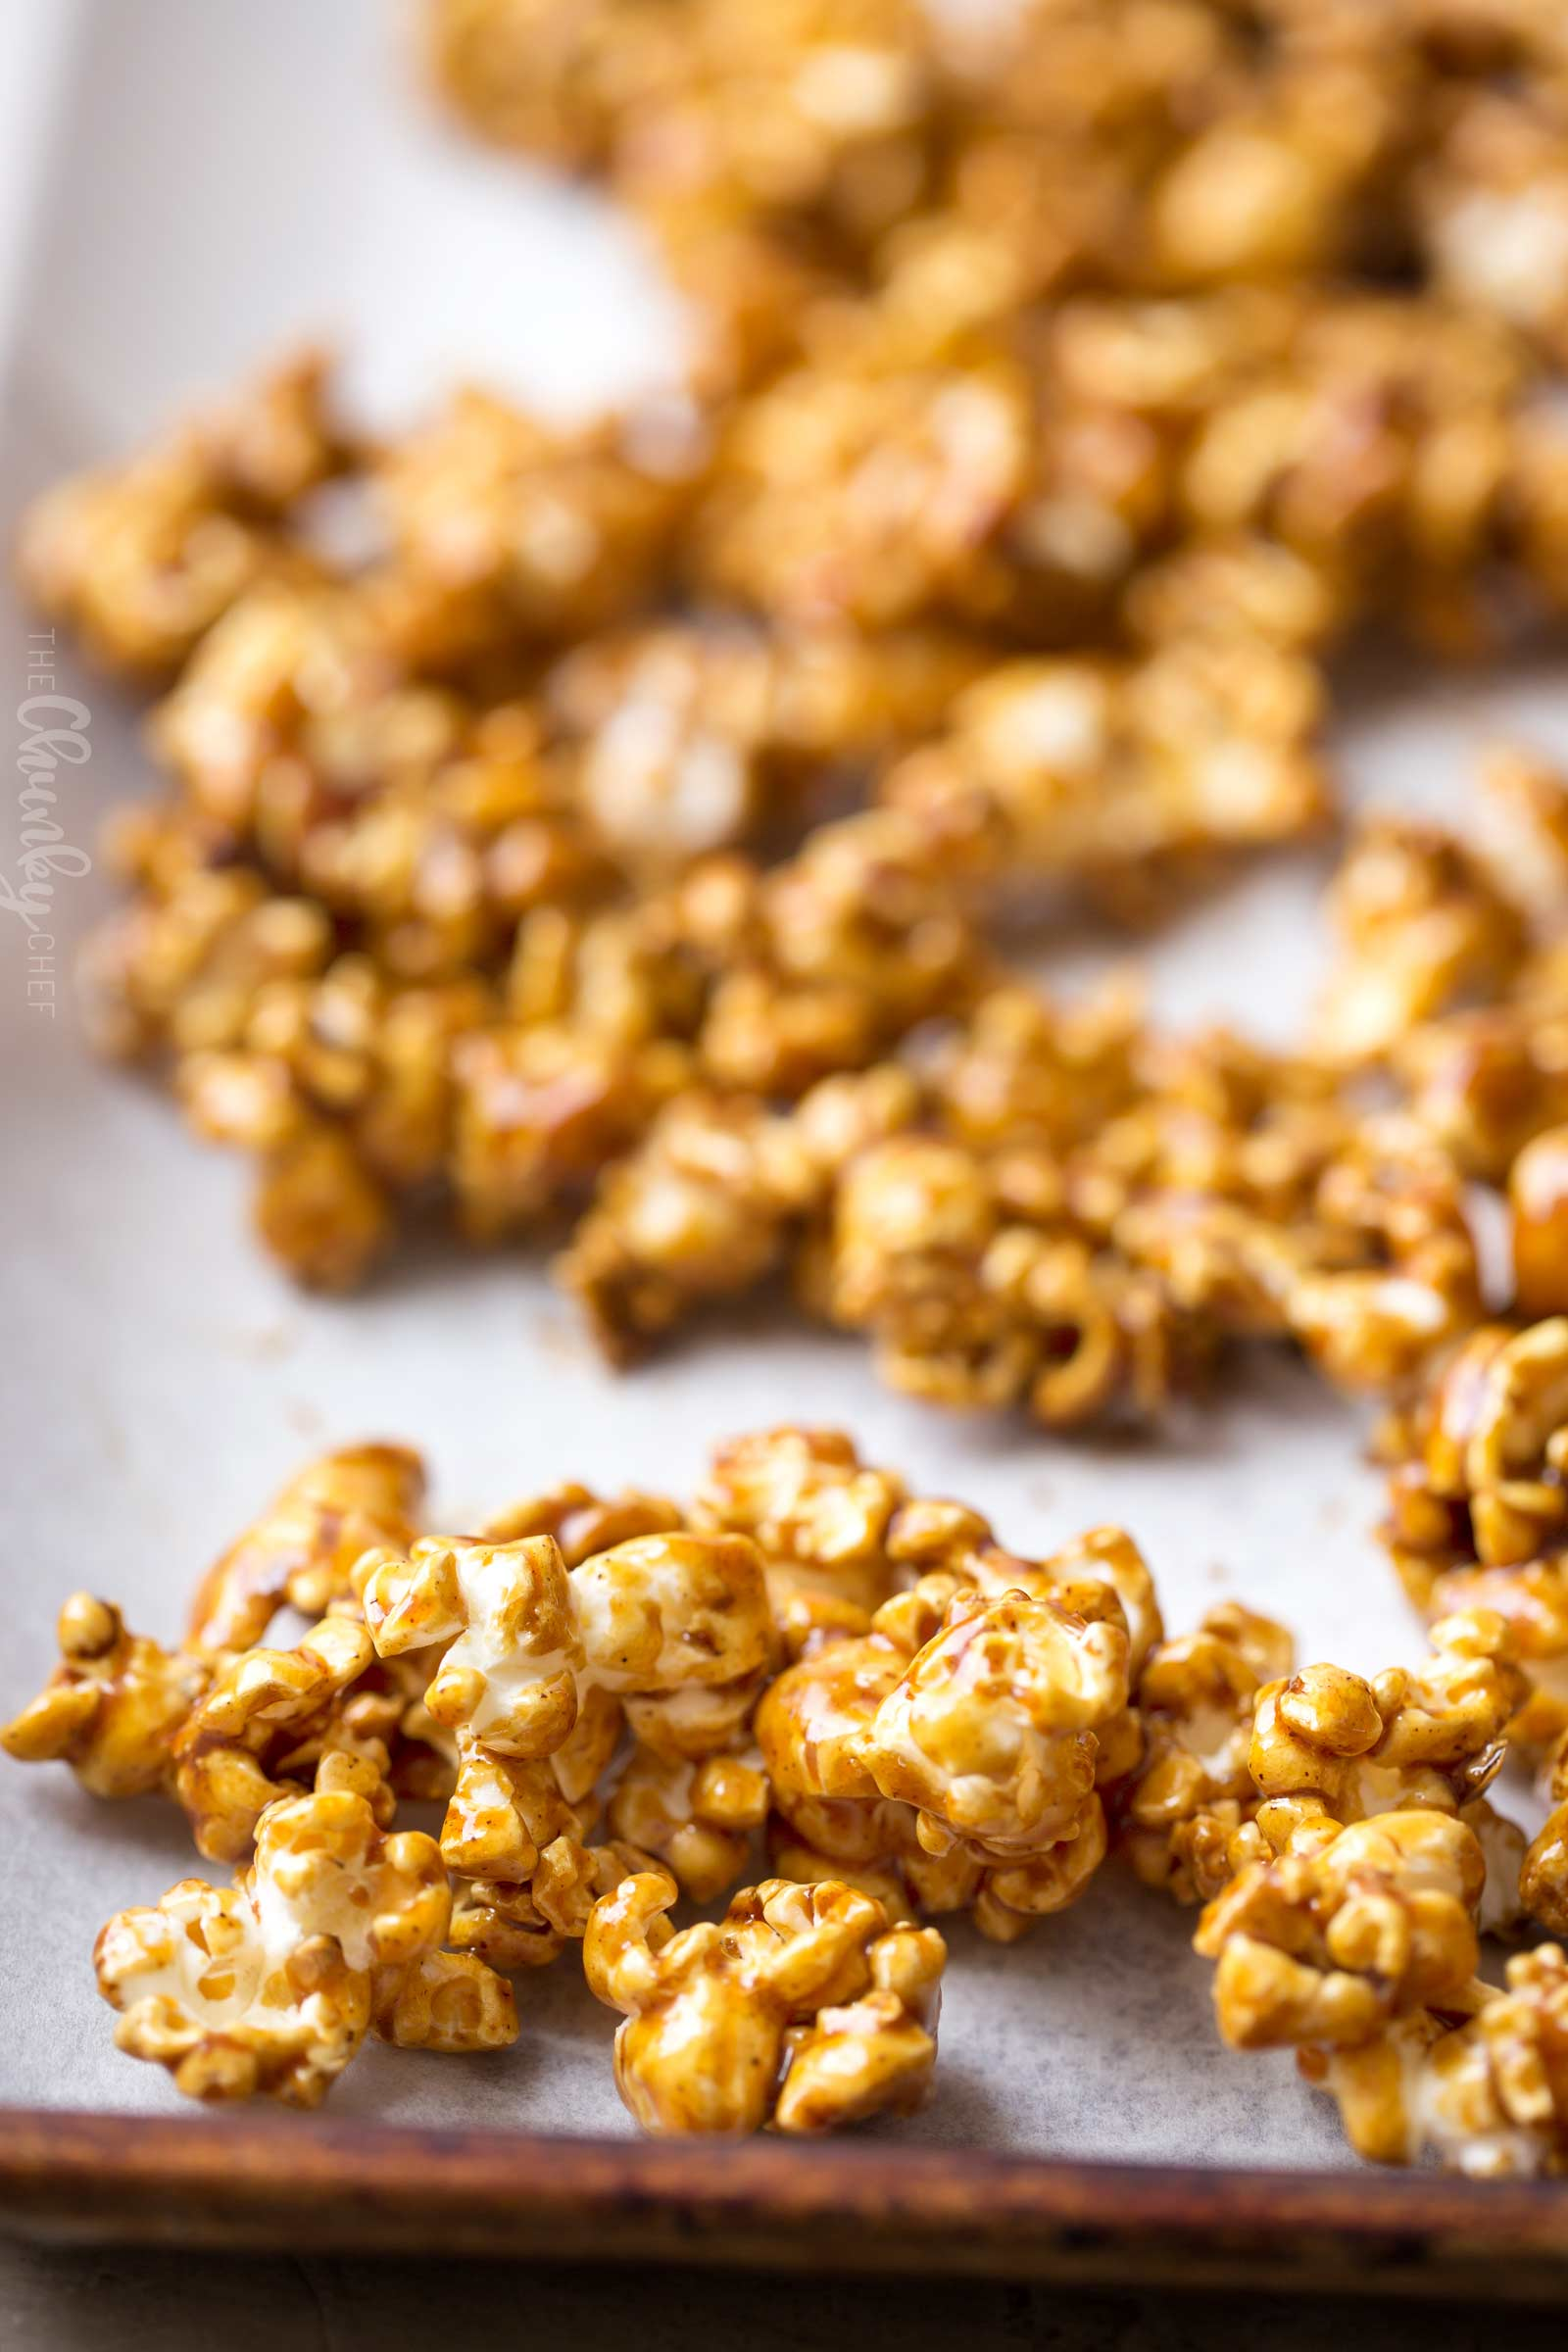 Fullsize Of Popcorn On Keto